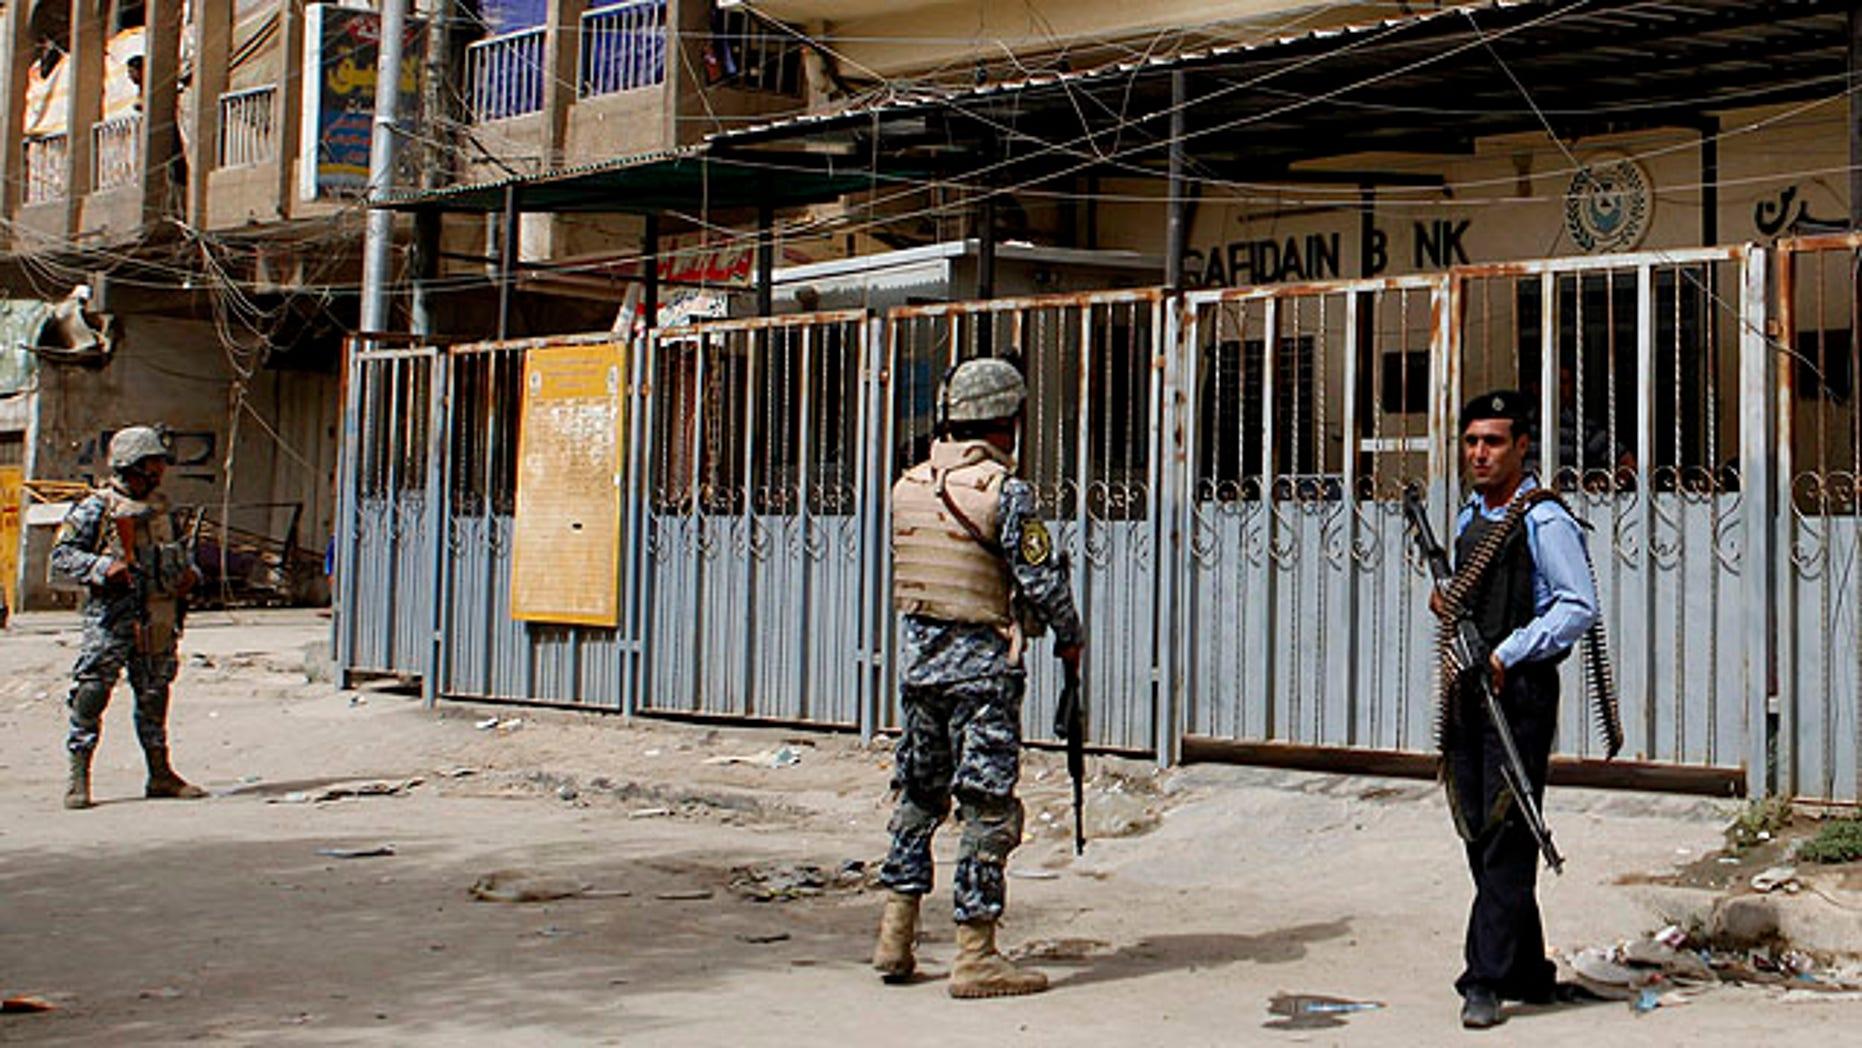 Sept. 30, 2010: Iraqi policemen stand guard outside the branch of the state-run al-Rafidain bank in southwestern Baghdad, Iraq.